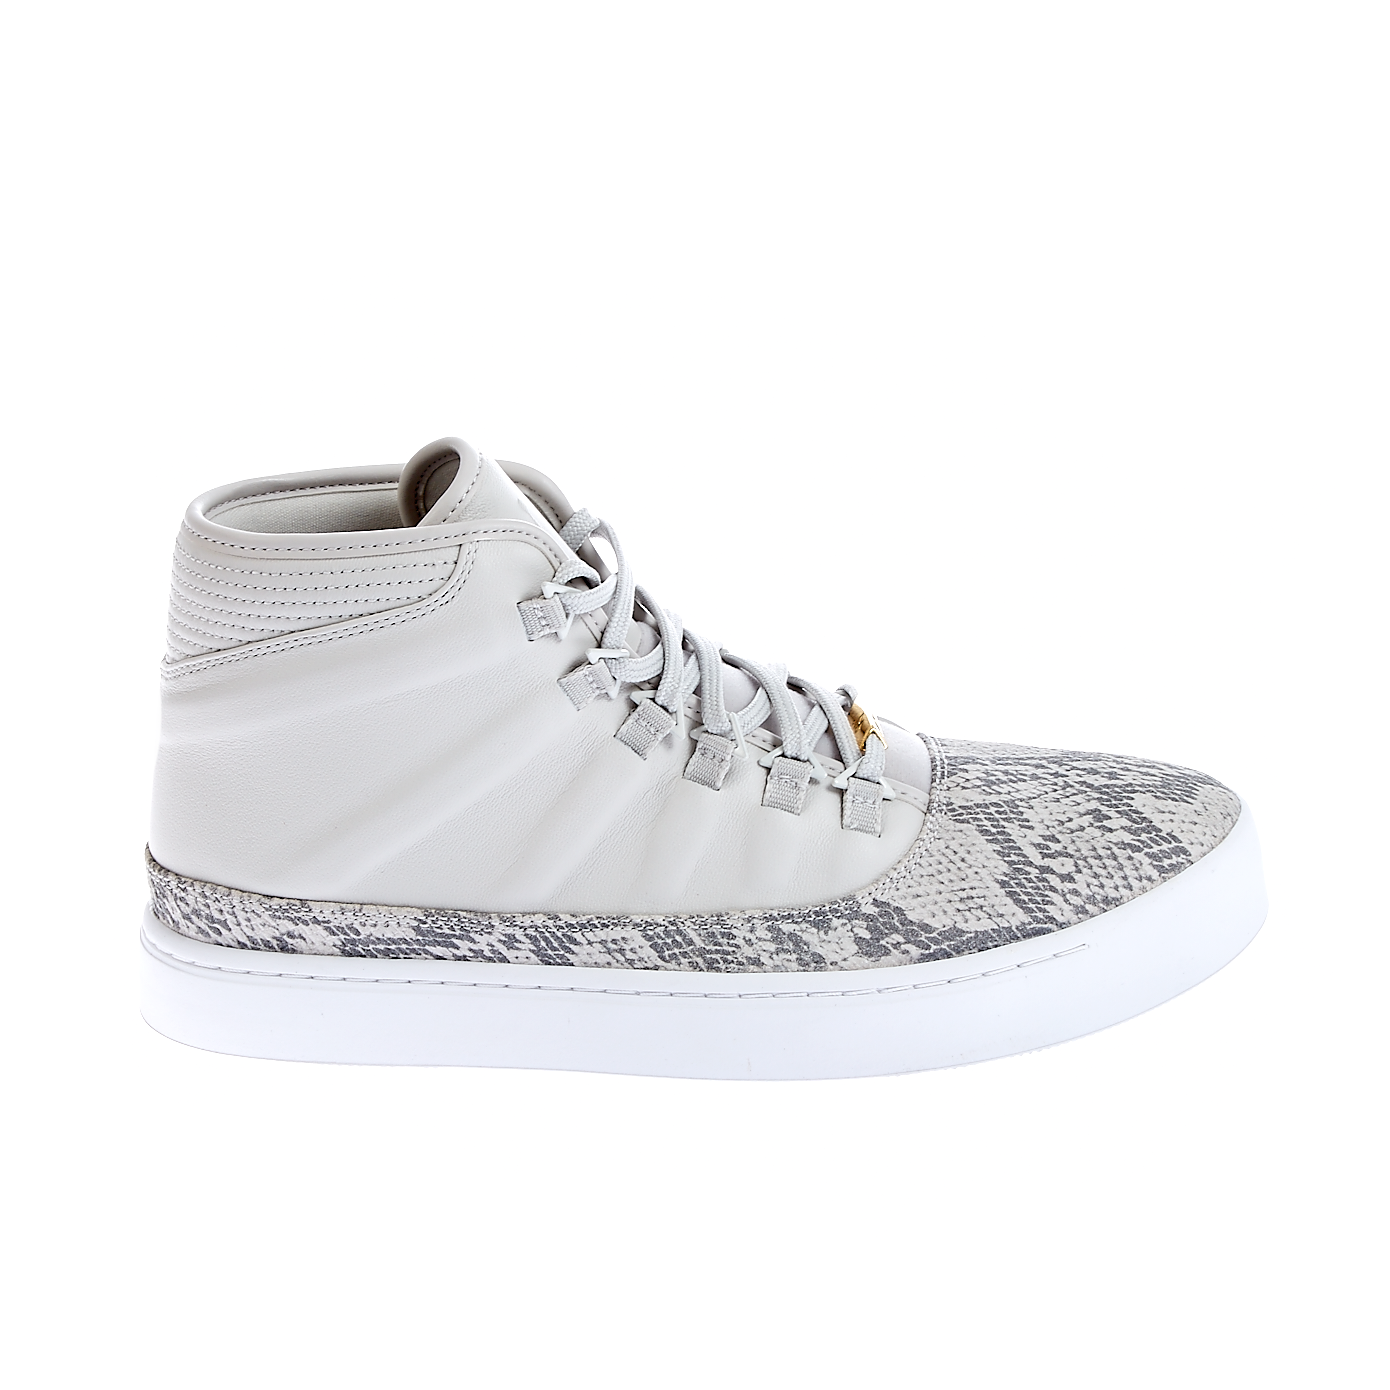 NIKE - Ανδρικά παπούτσια Nike JORDAN WESTBROOK εκρού